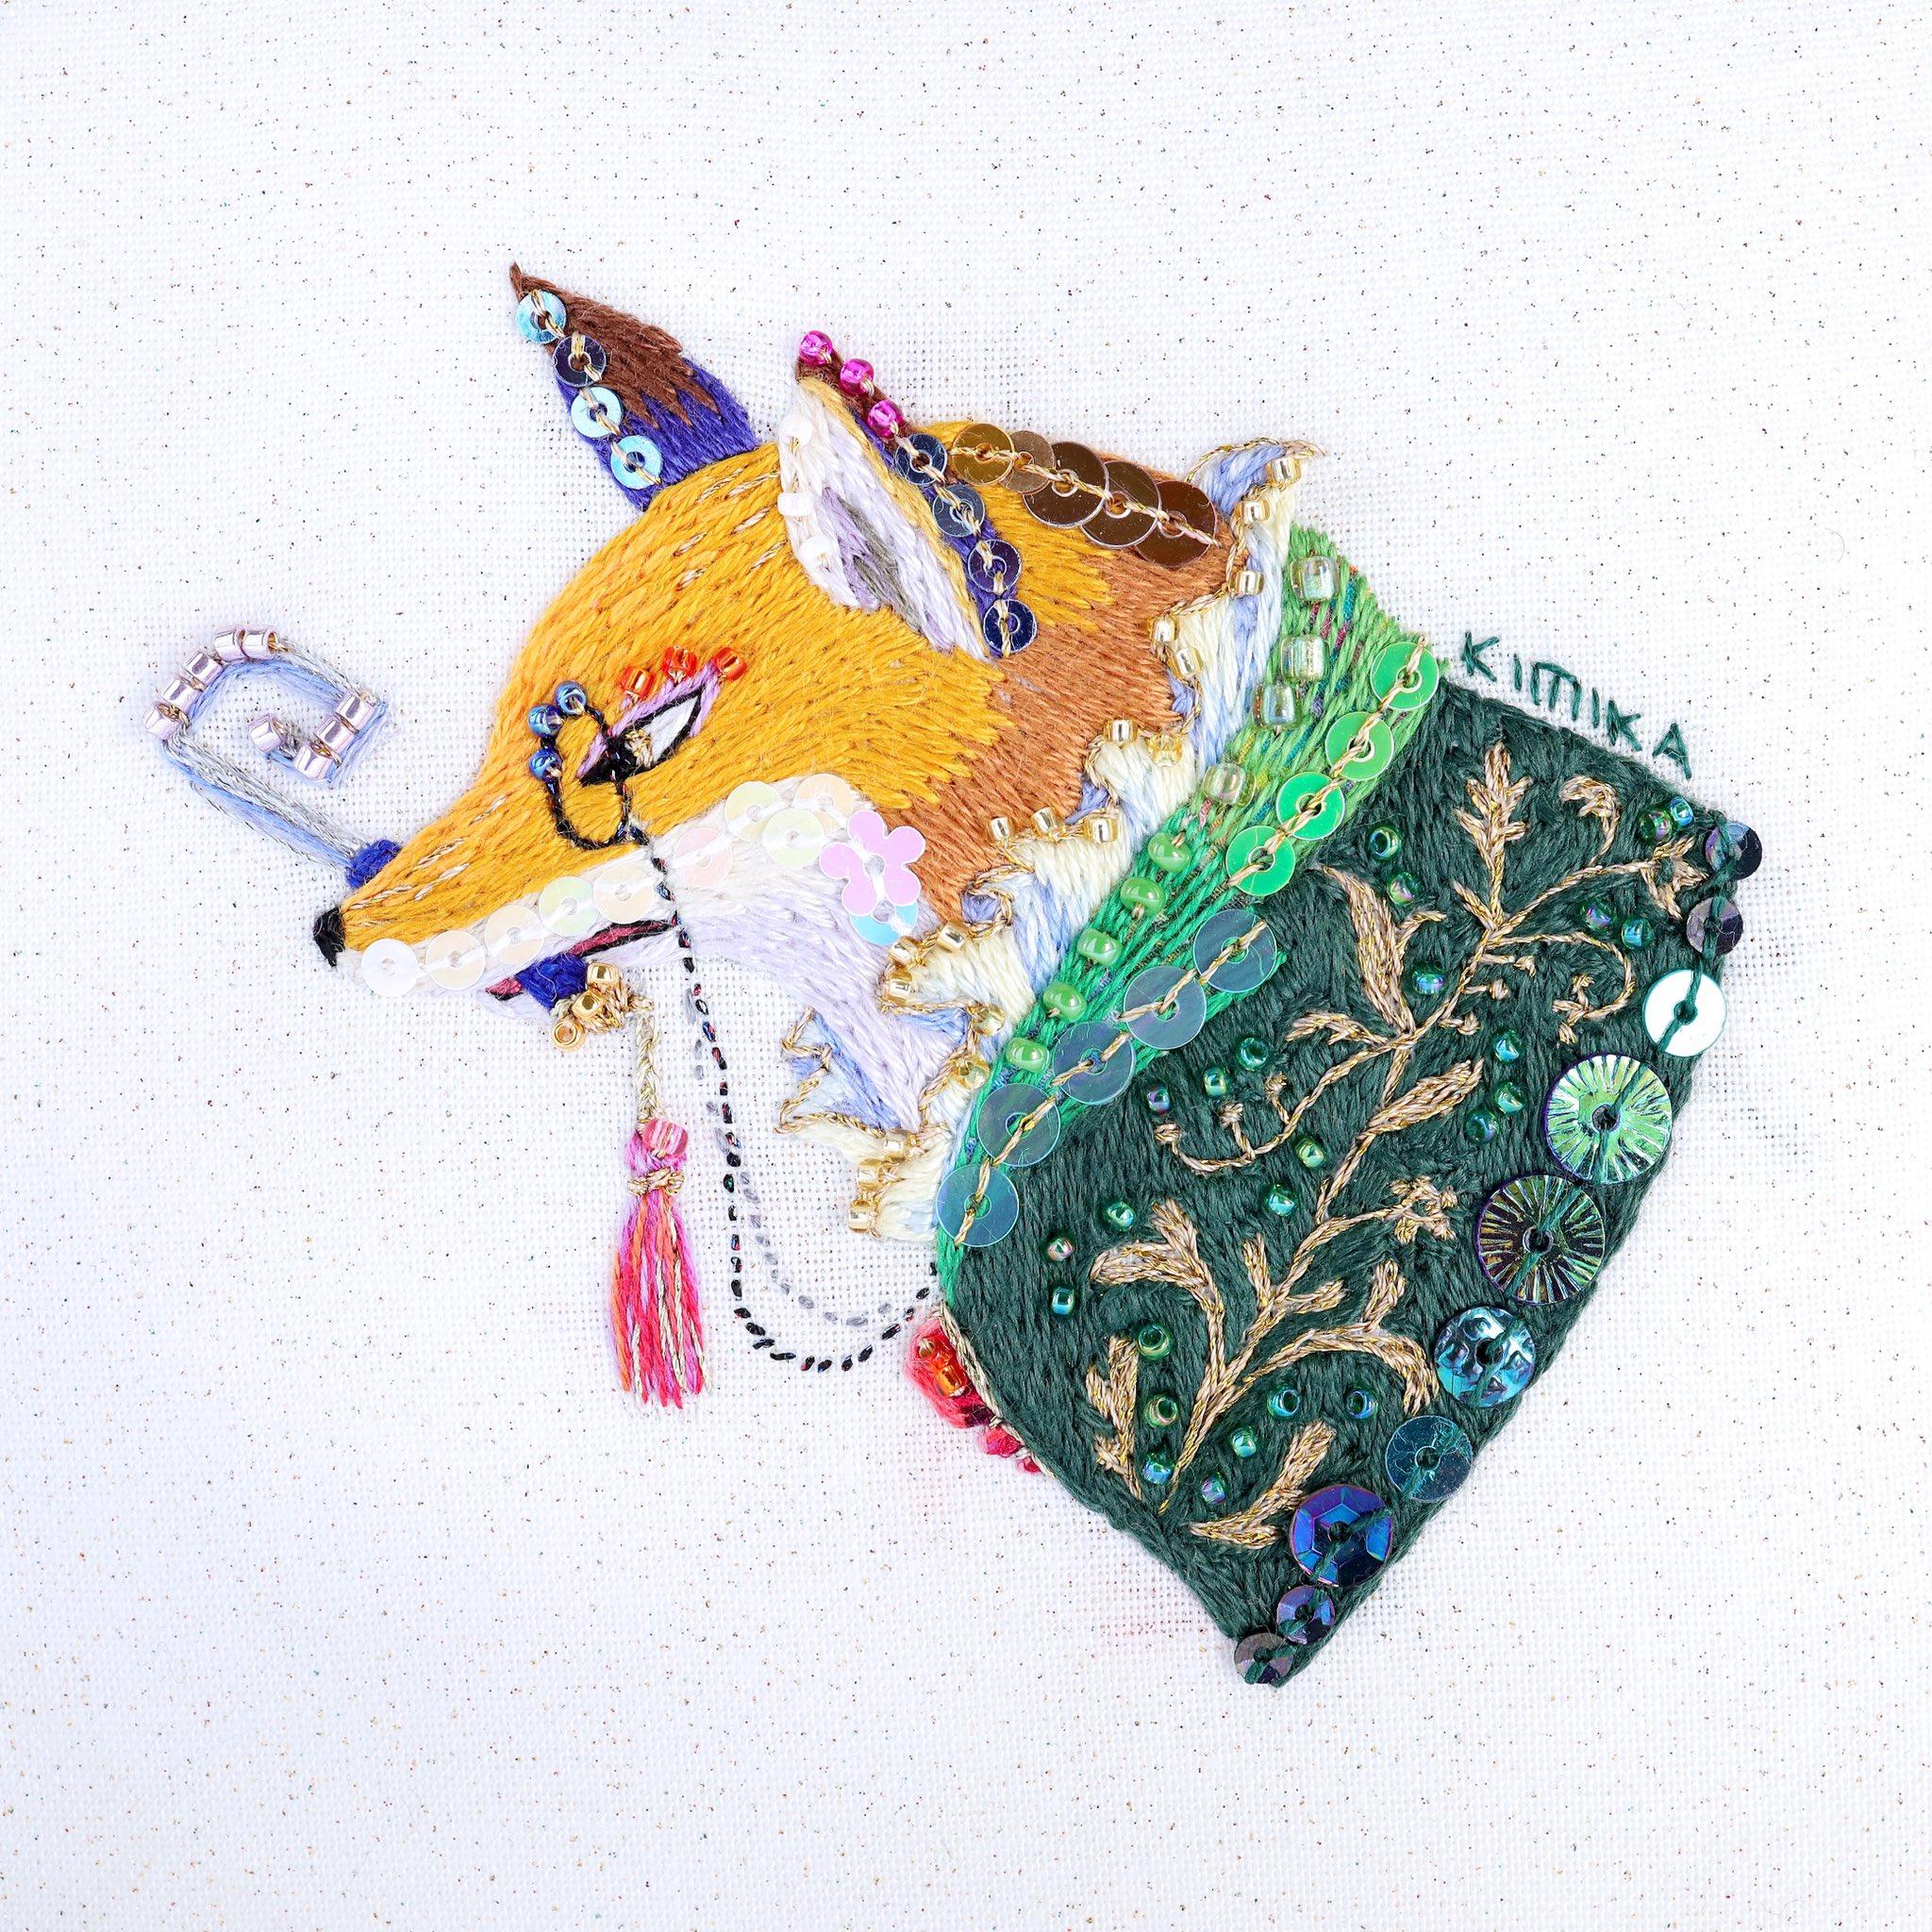 fox-minister-of-the-forest-kingdom-kimika-hara- Fox Minister of the Forest Kingdom by Kimika Hara